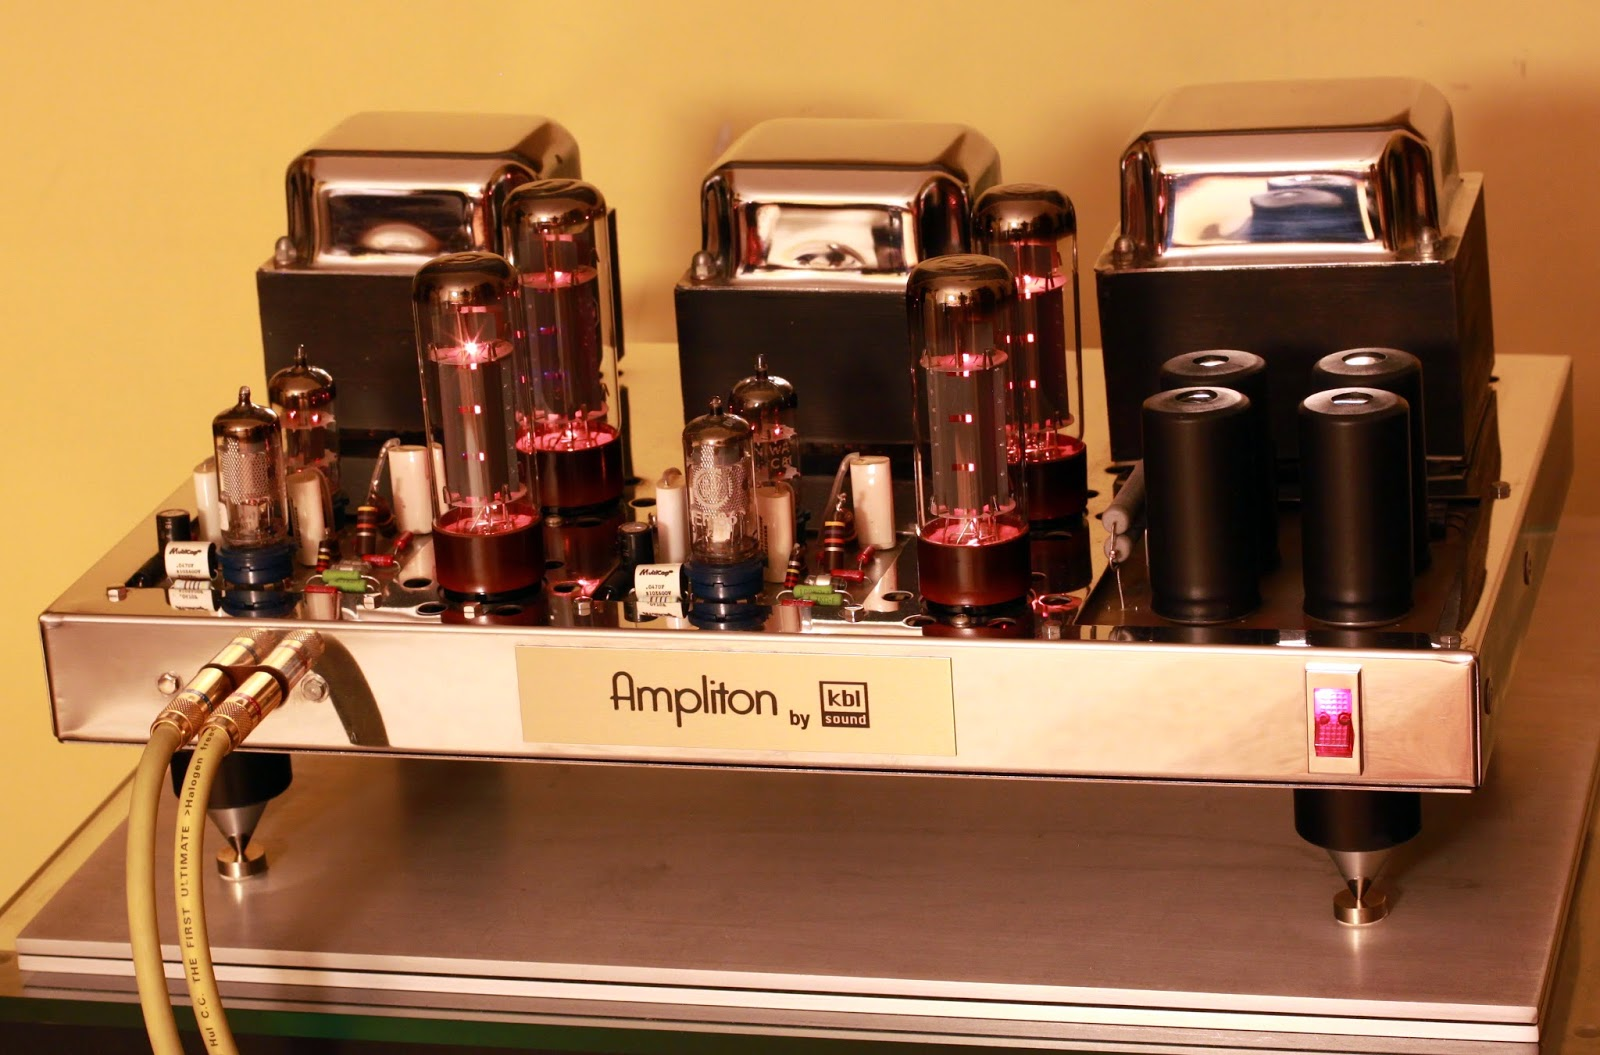 Ampliton Jadis KBL sound tube power amplifier